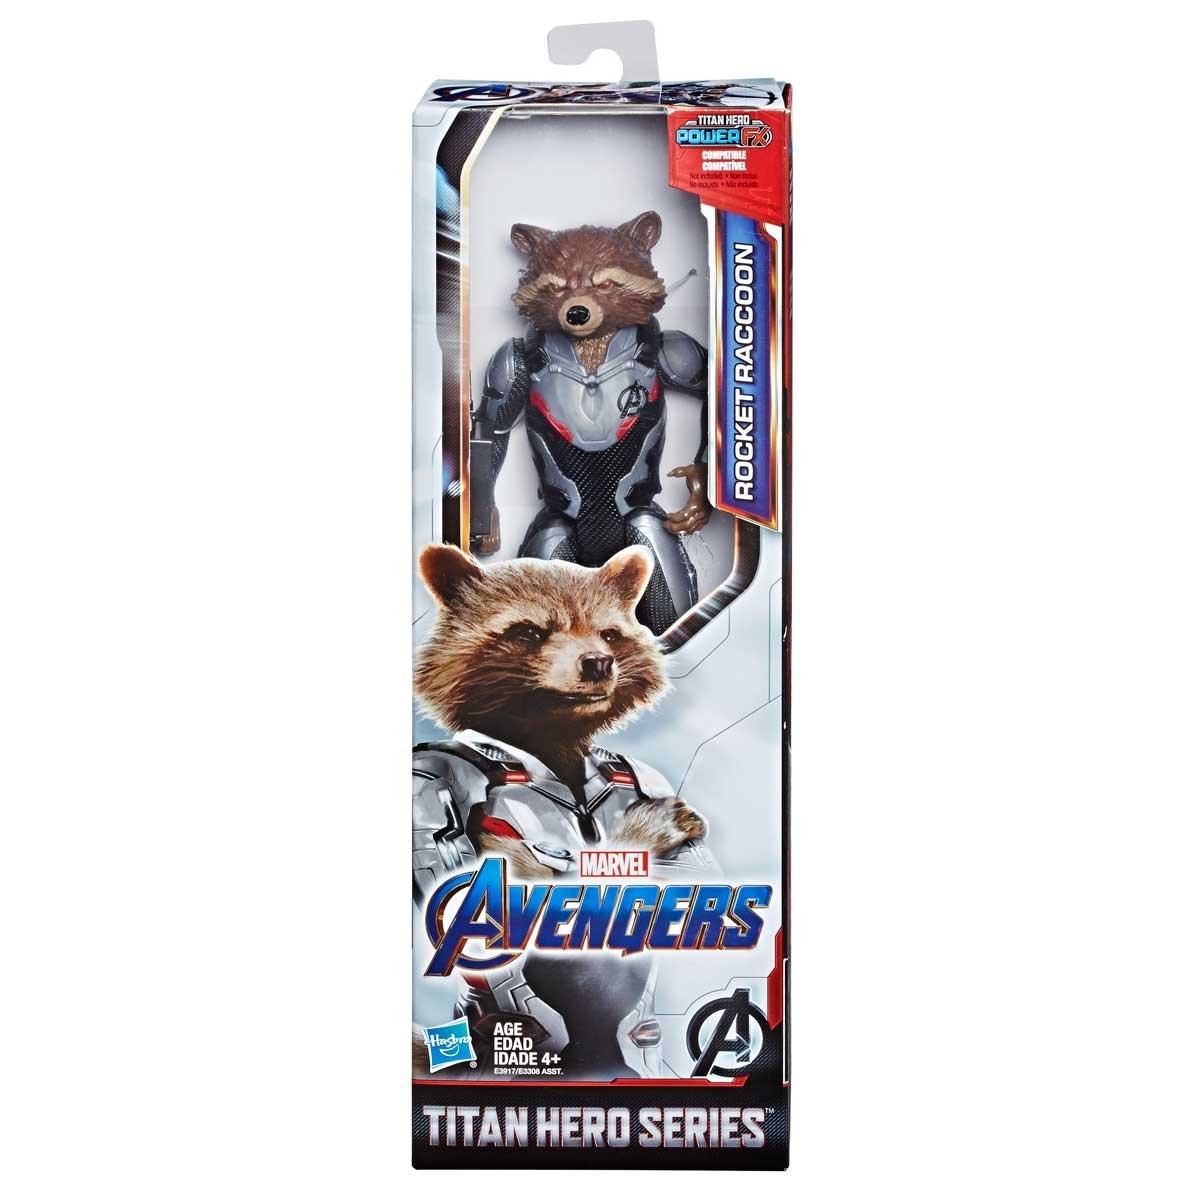 Figura Titan Hero Avengers Endgame Rocket Racoon Hasbro